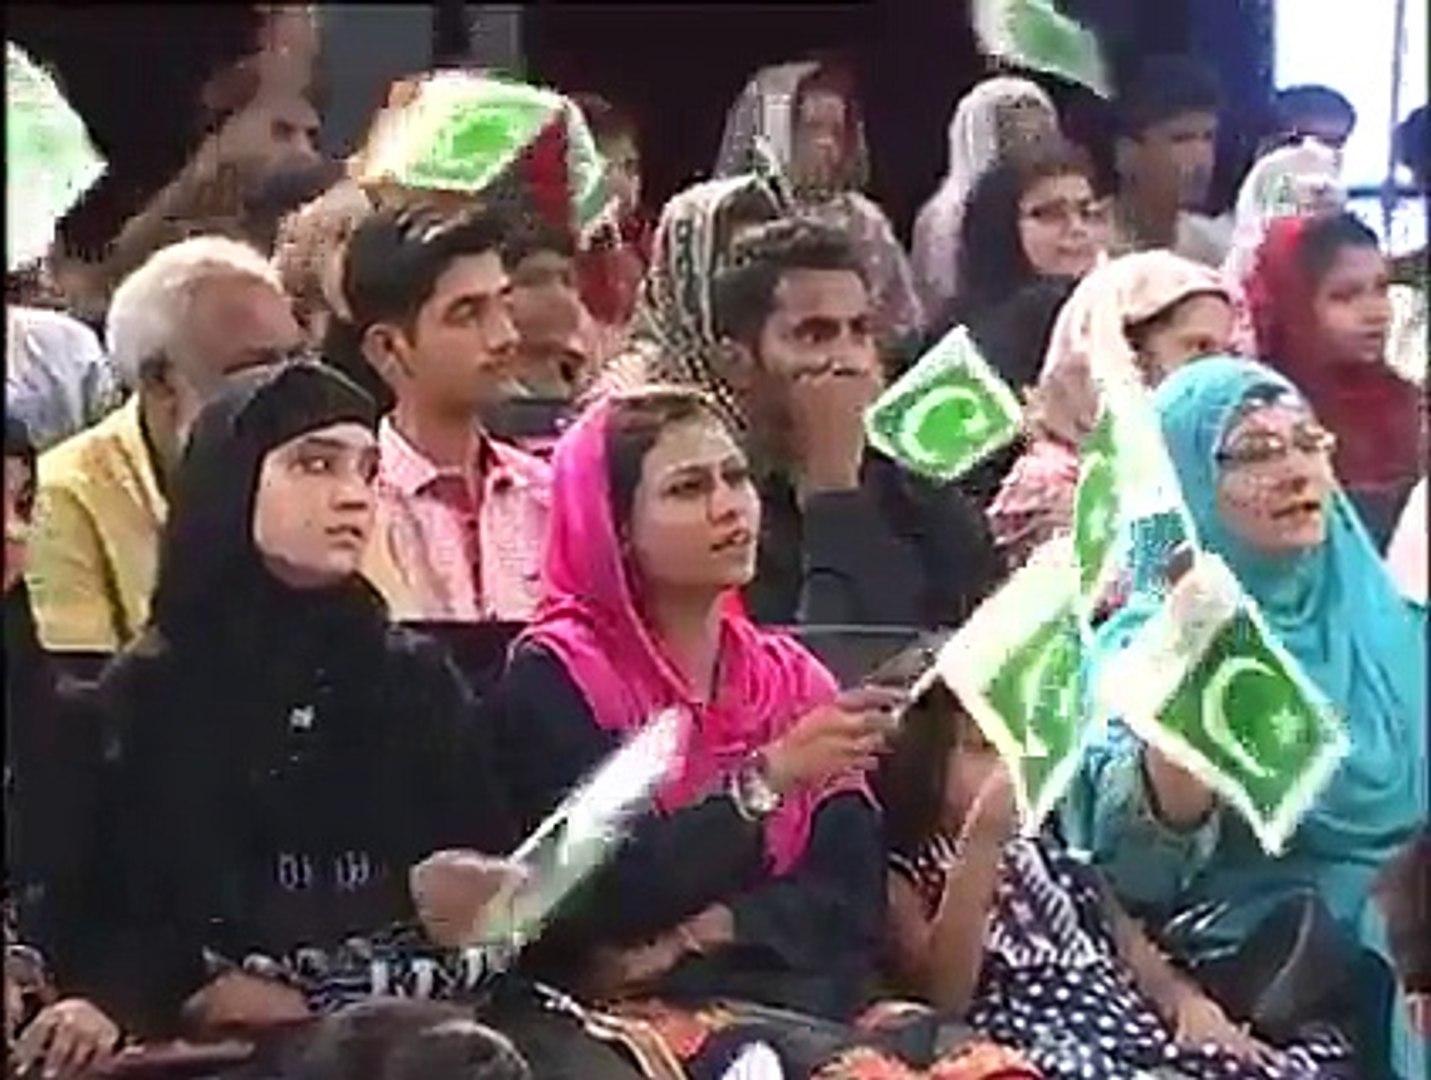 Army Public School Attack Victim's Memory - Muniba Mazari To Pay Tribute Crying And Singing Bea